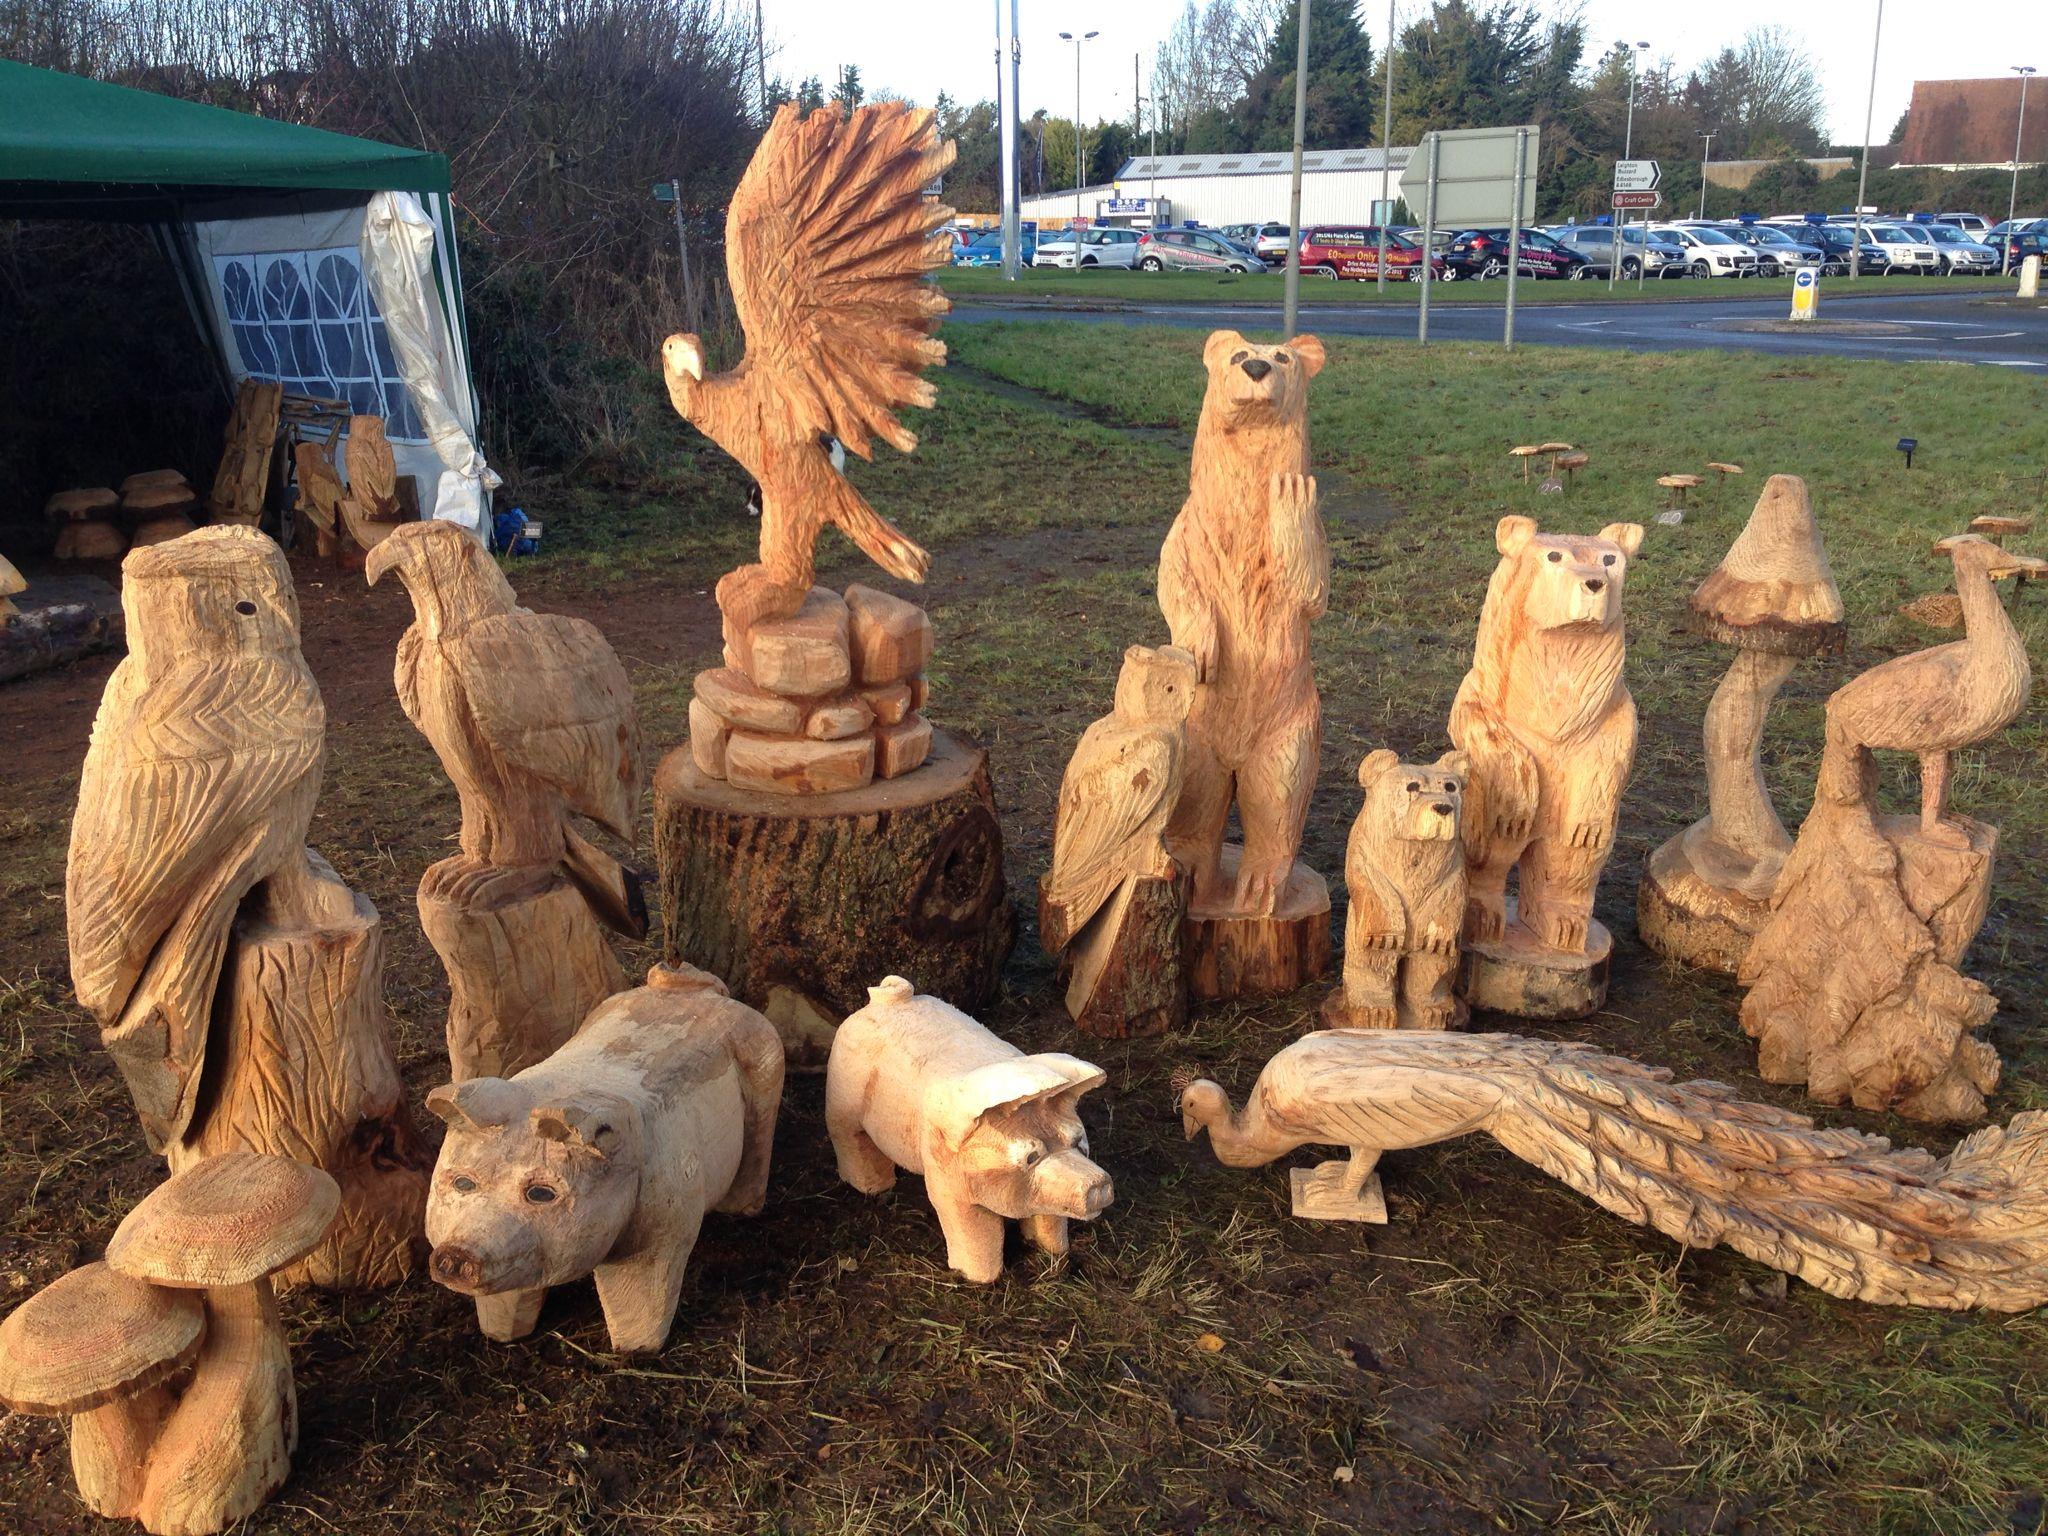 Little display figuras de madera pinterest display chainsaw